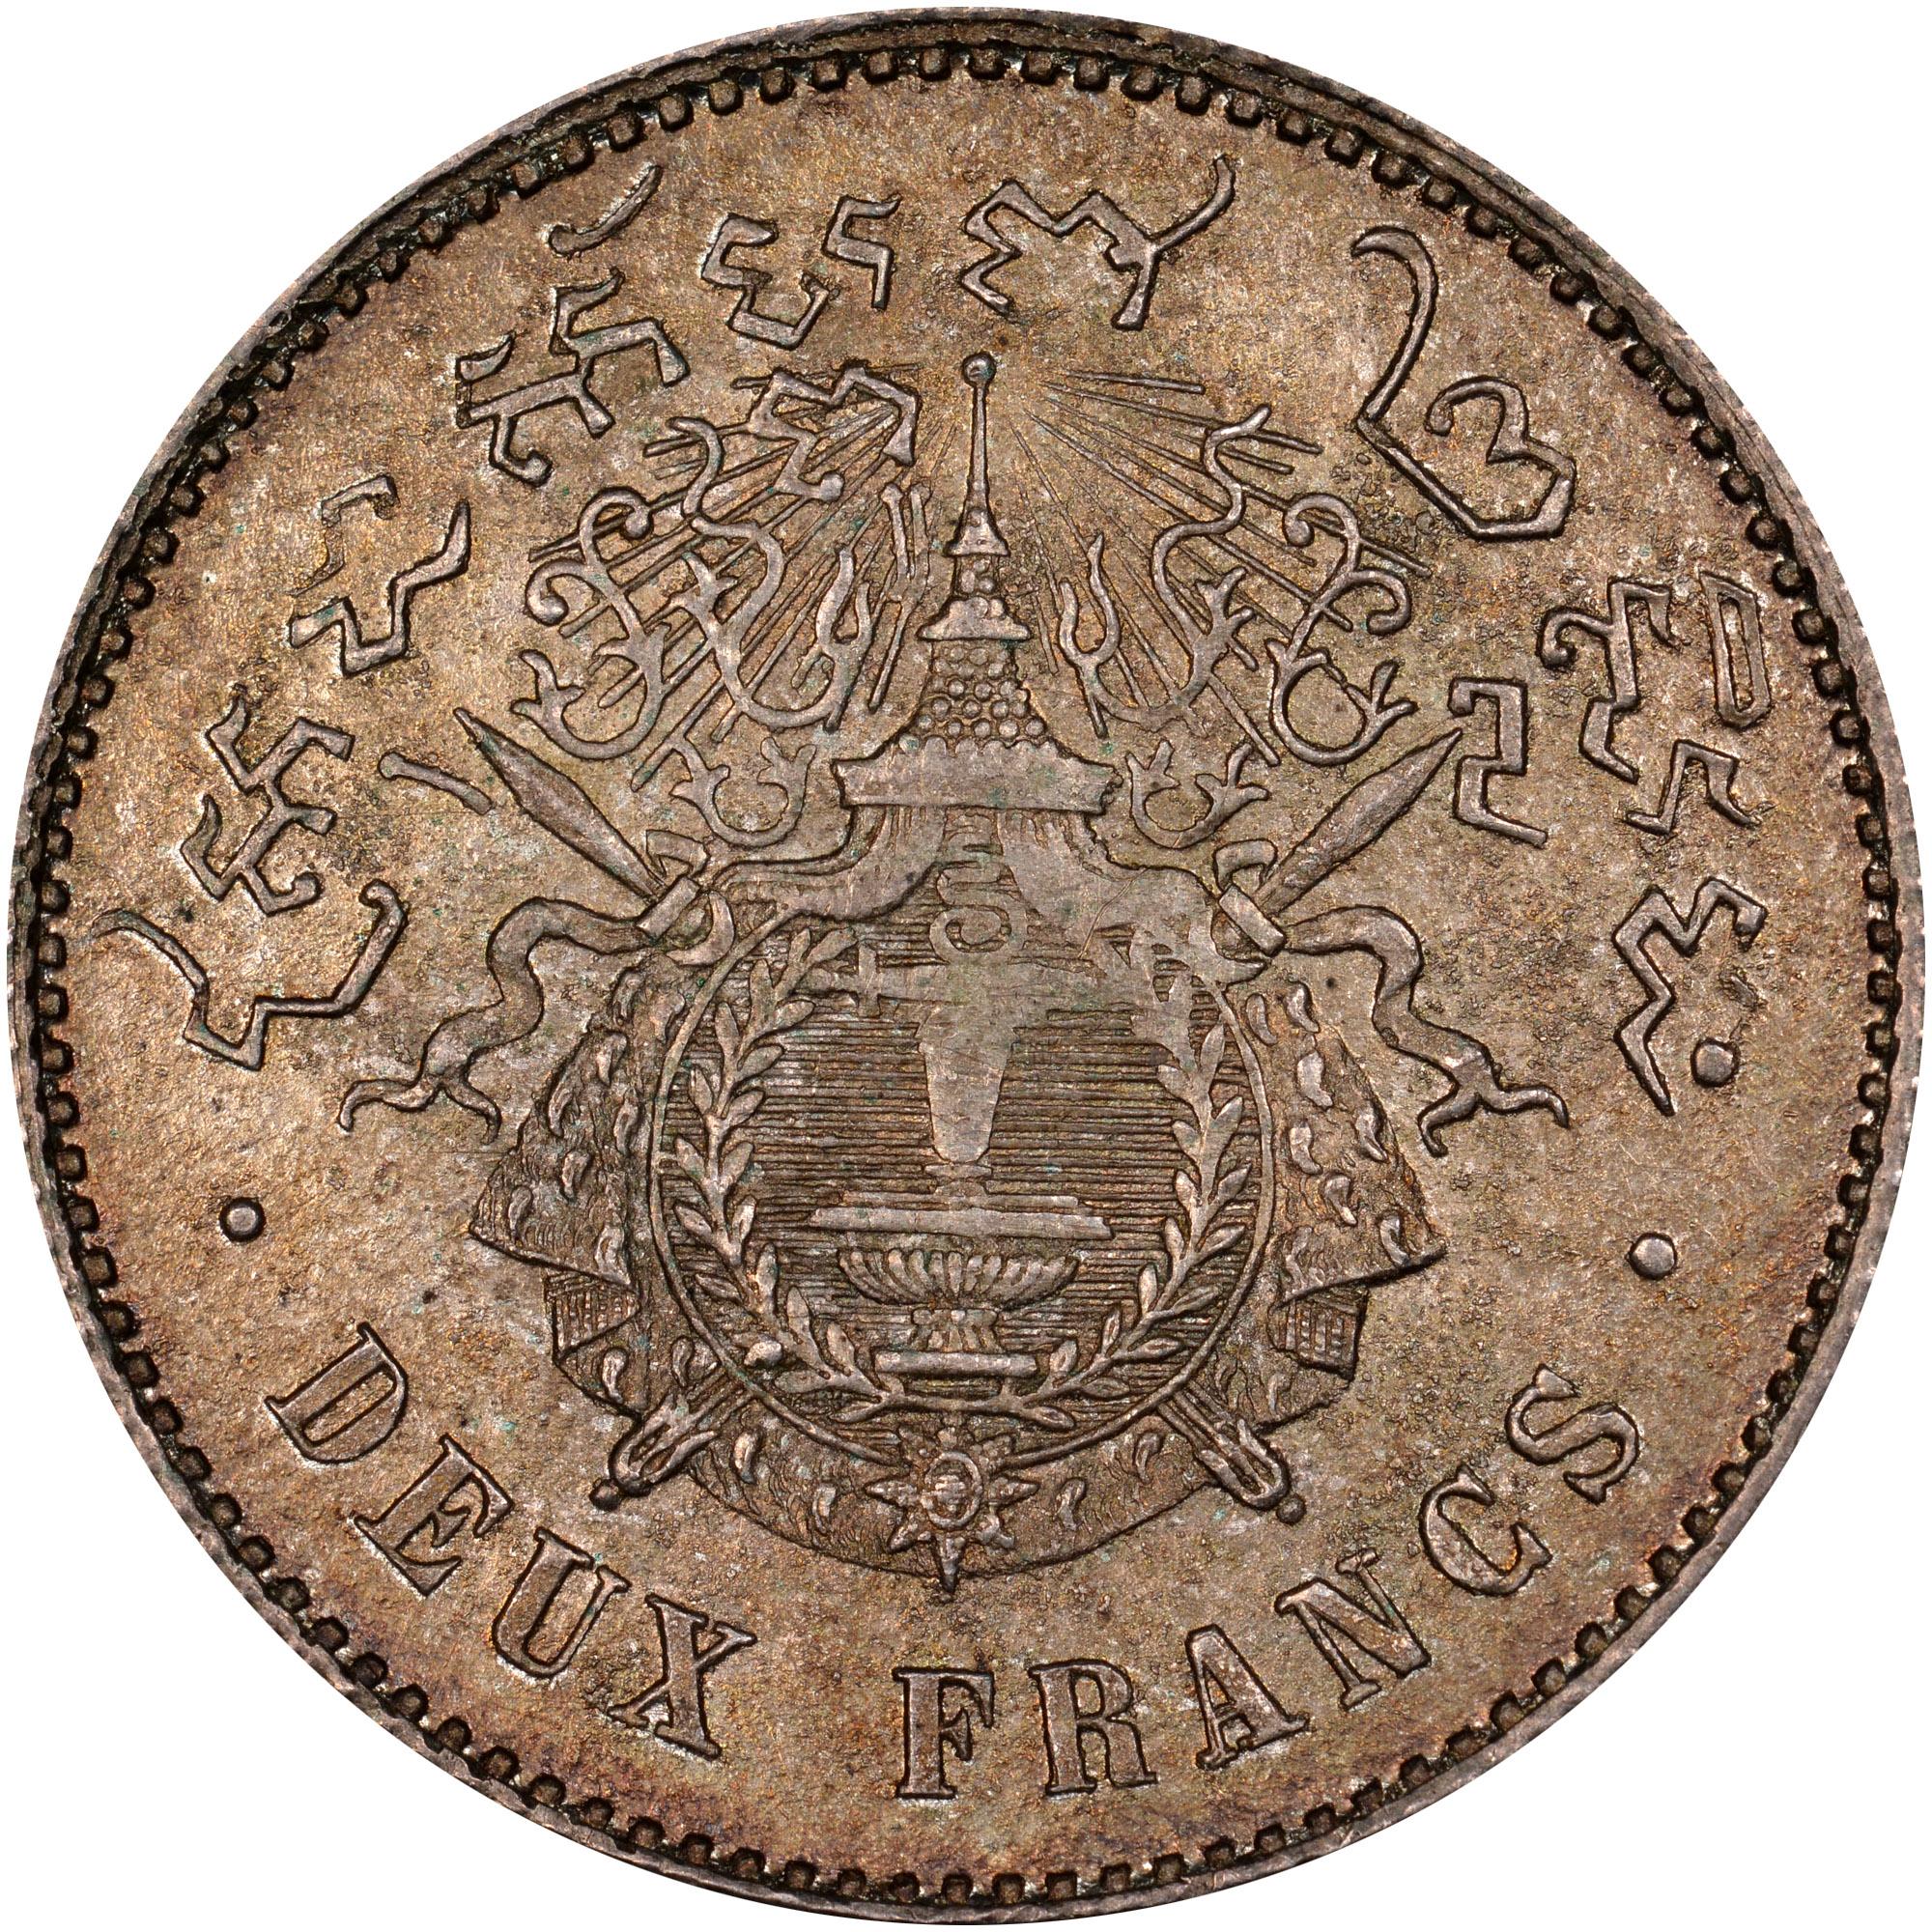 1860 Cambodia 2 Francs reverse